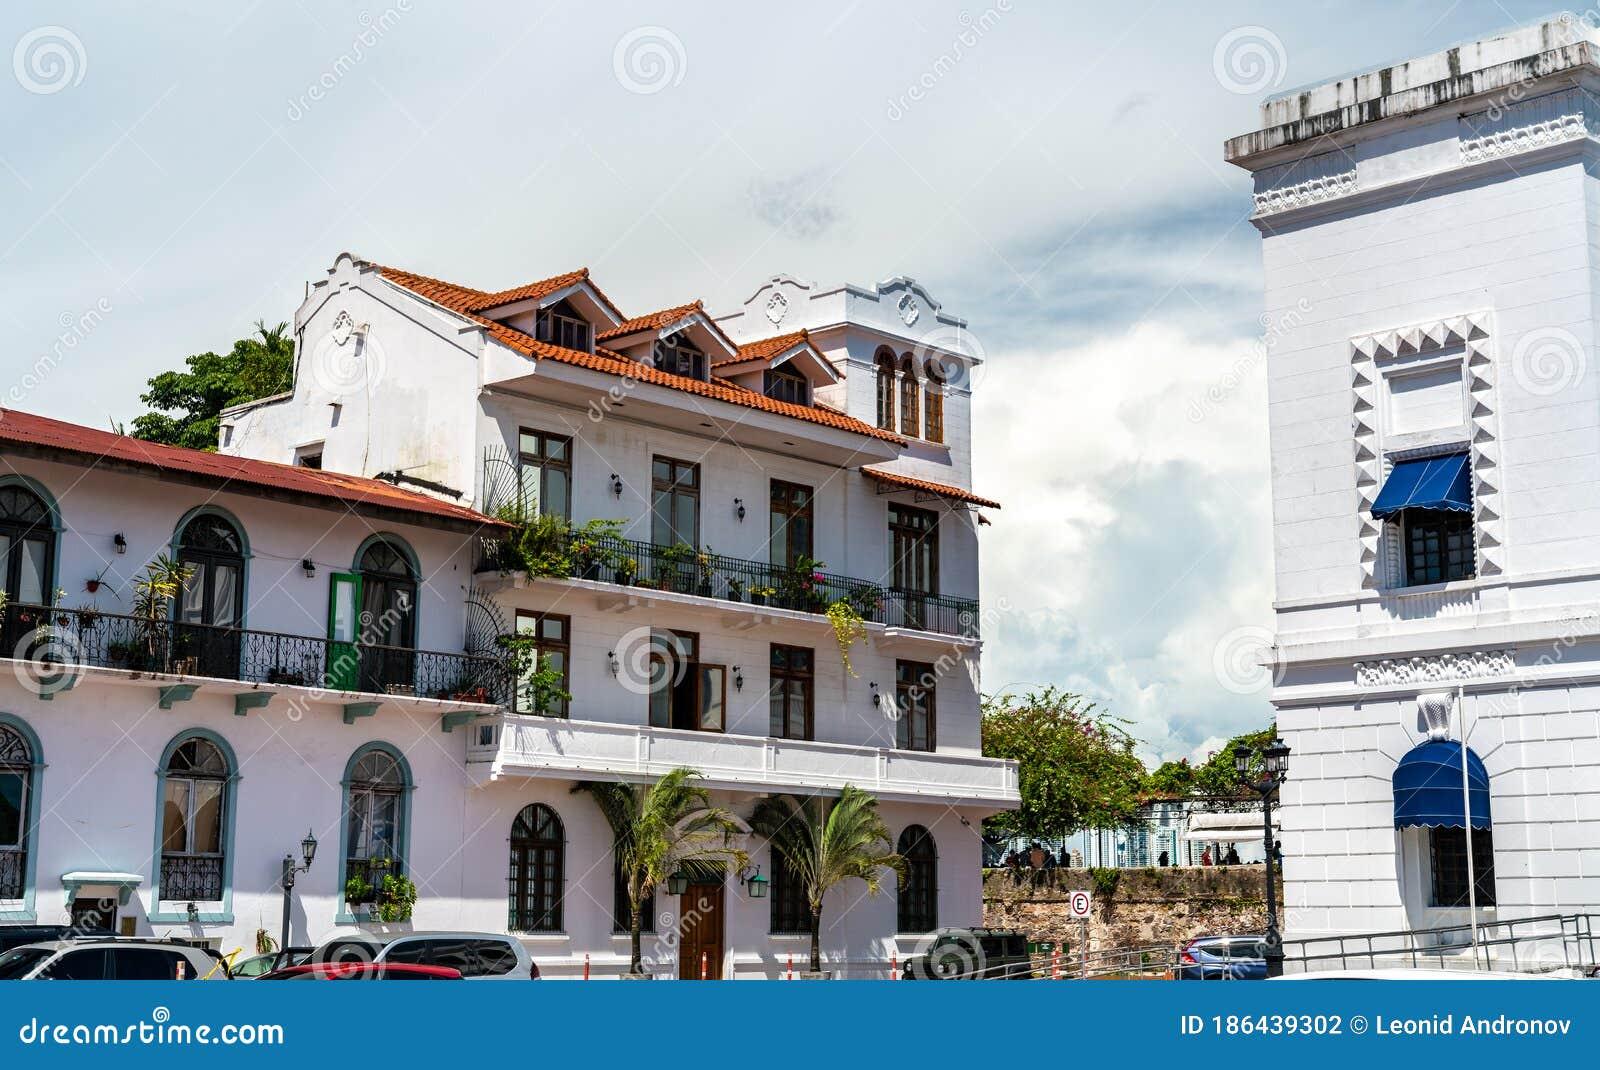 Spanish Colonial Buildings In Casco Viejo Panama City Stock Photo Image Of City Antiguo 186439302